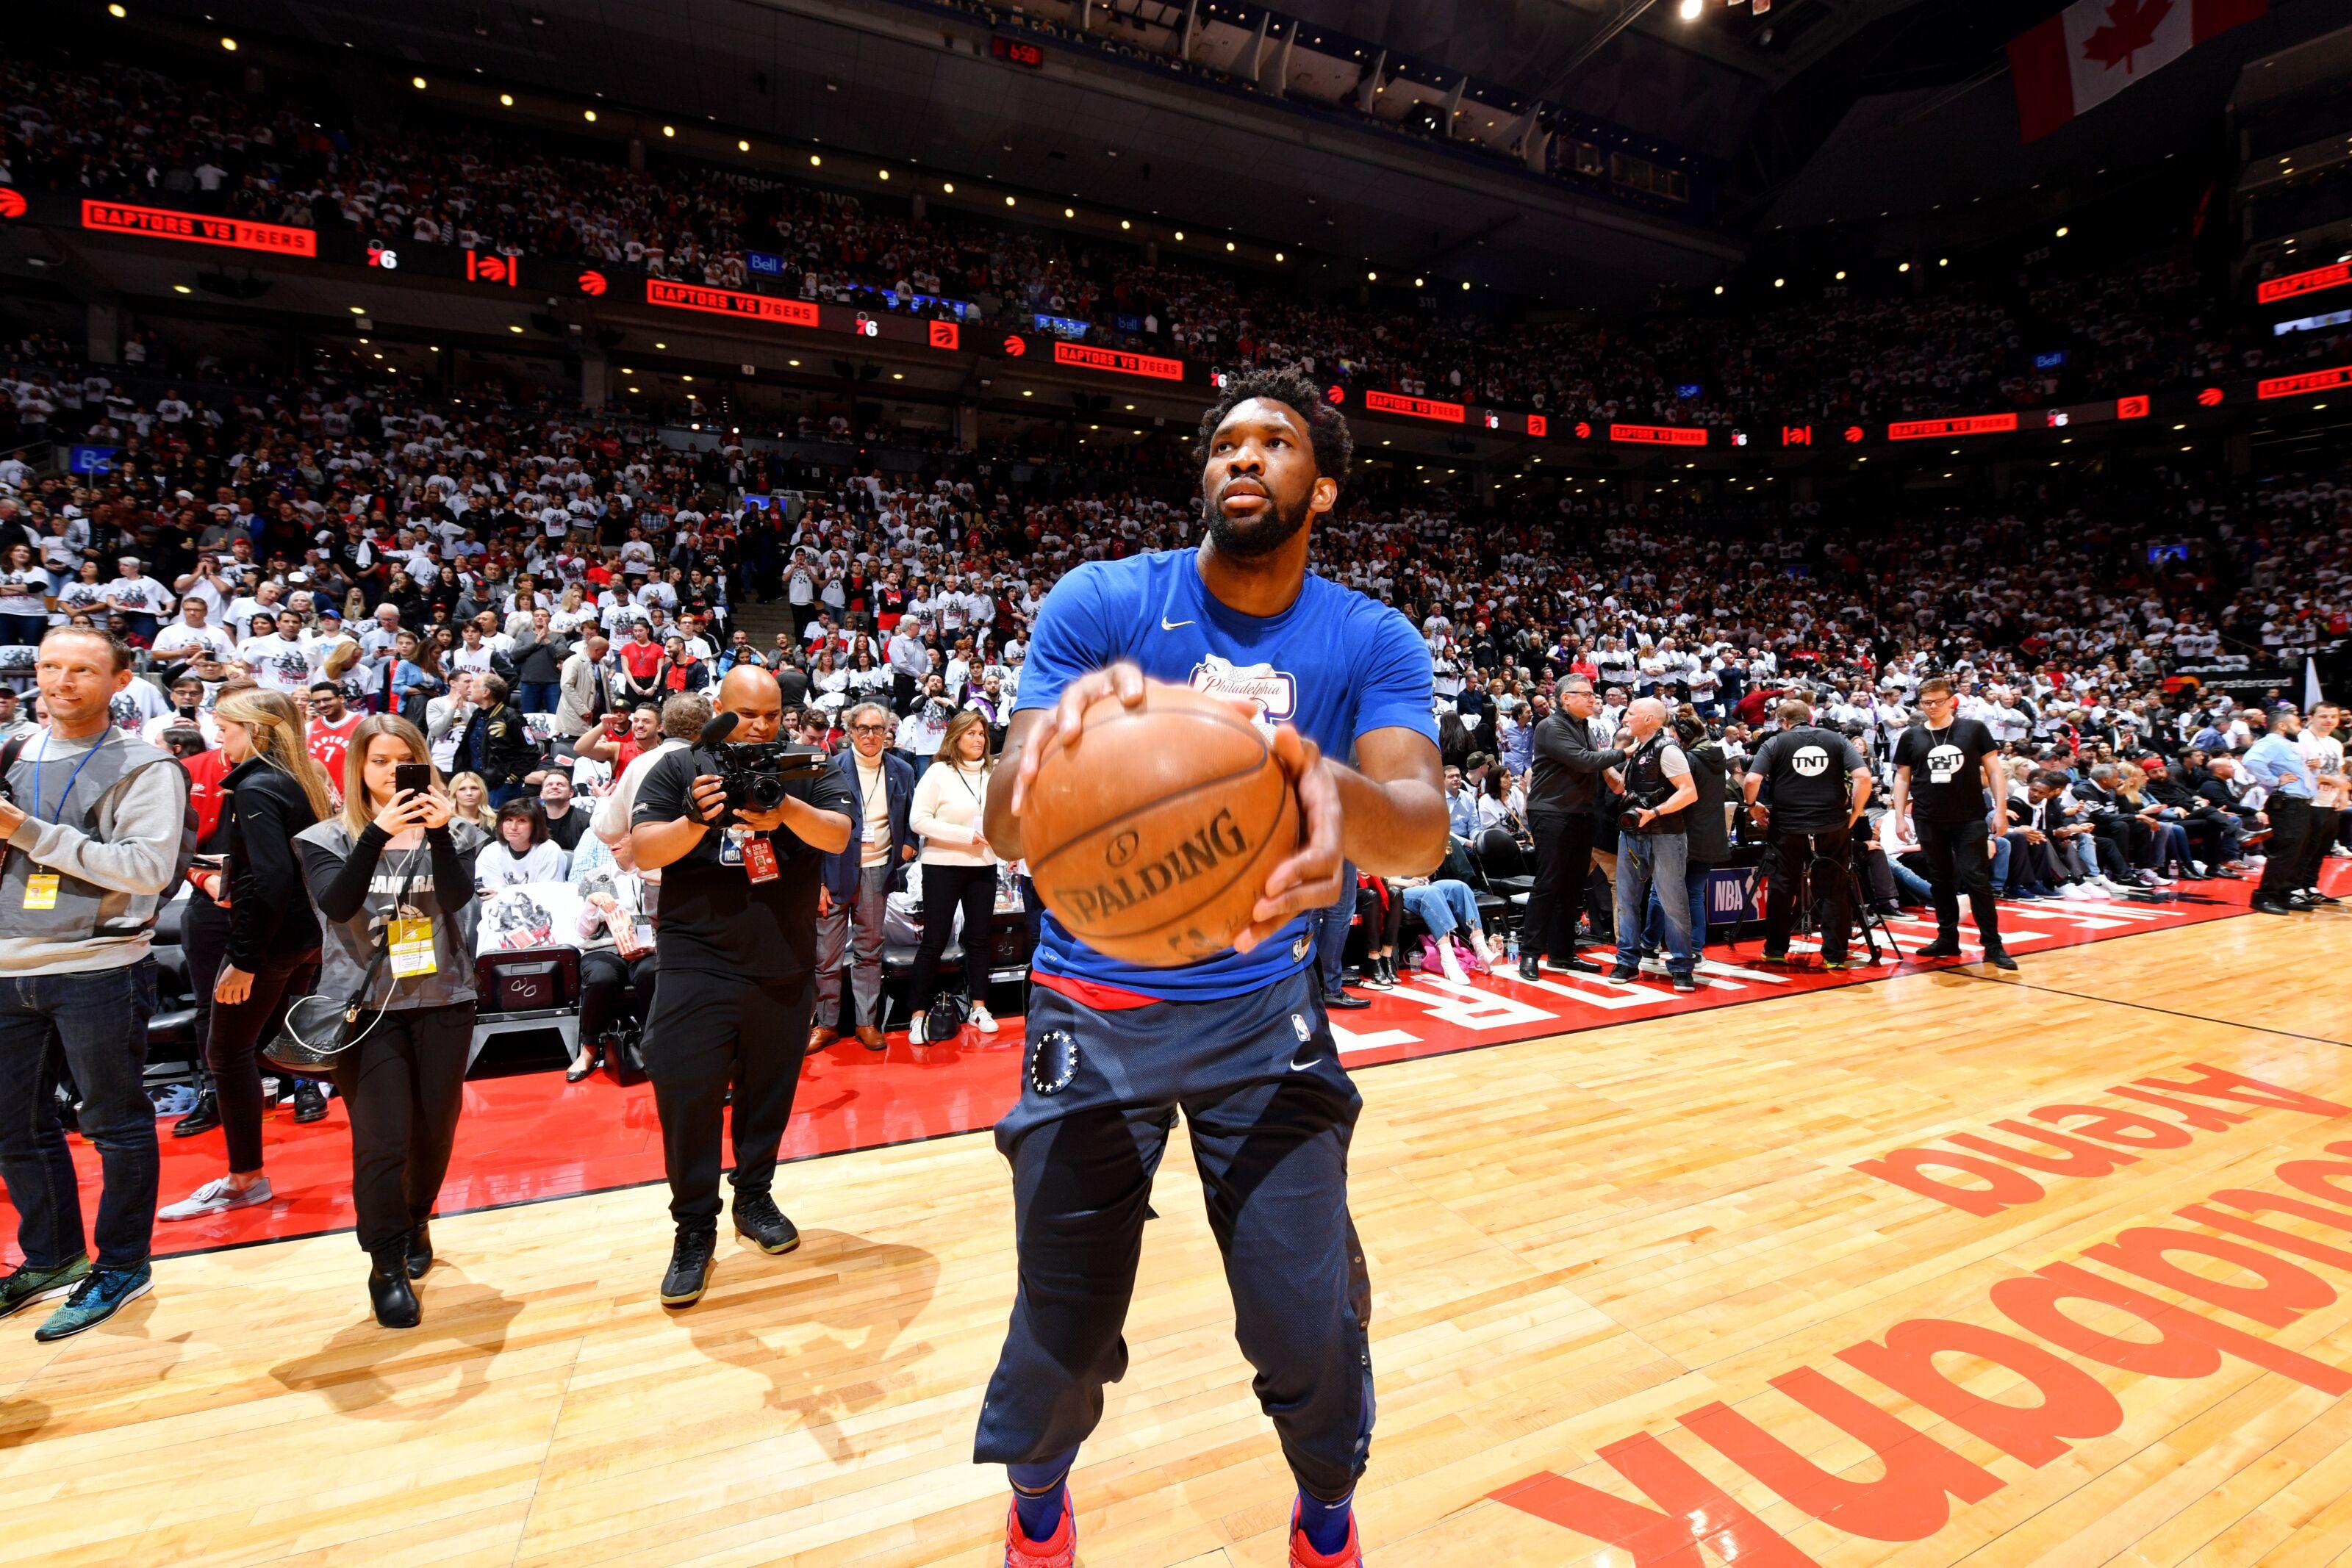 Philadelphia 76ers' success hinges on Joel Embiid's conditioning